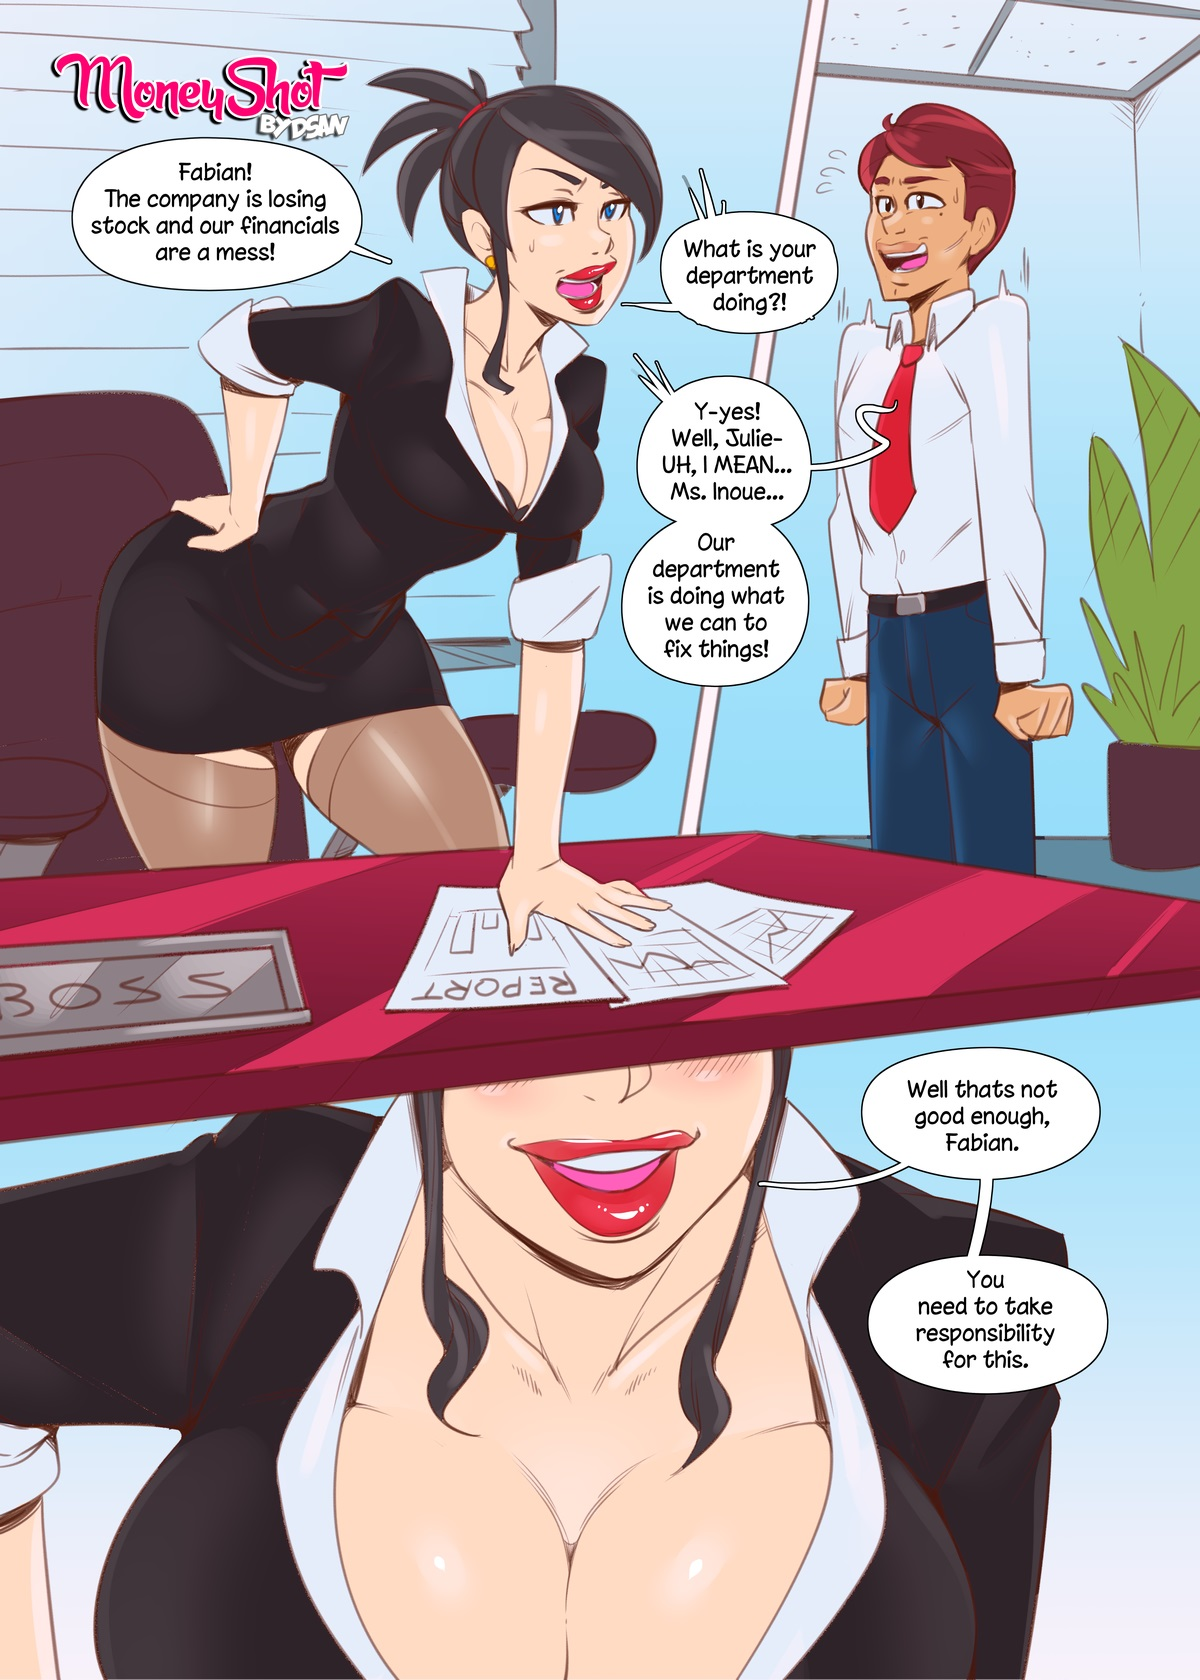 Porn Comics - Moneyshot by Dsan porn comics 8 muses